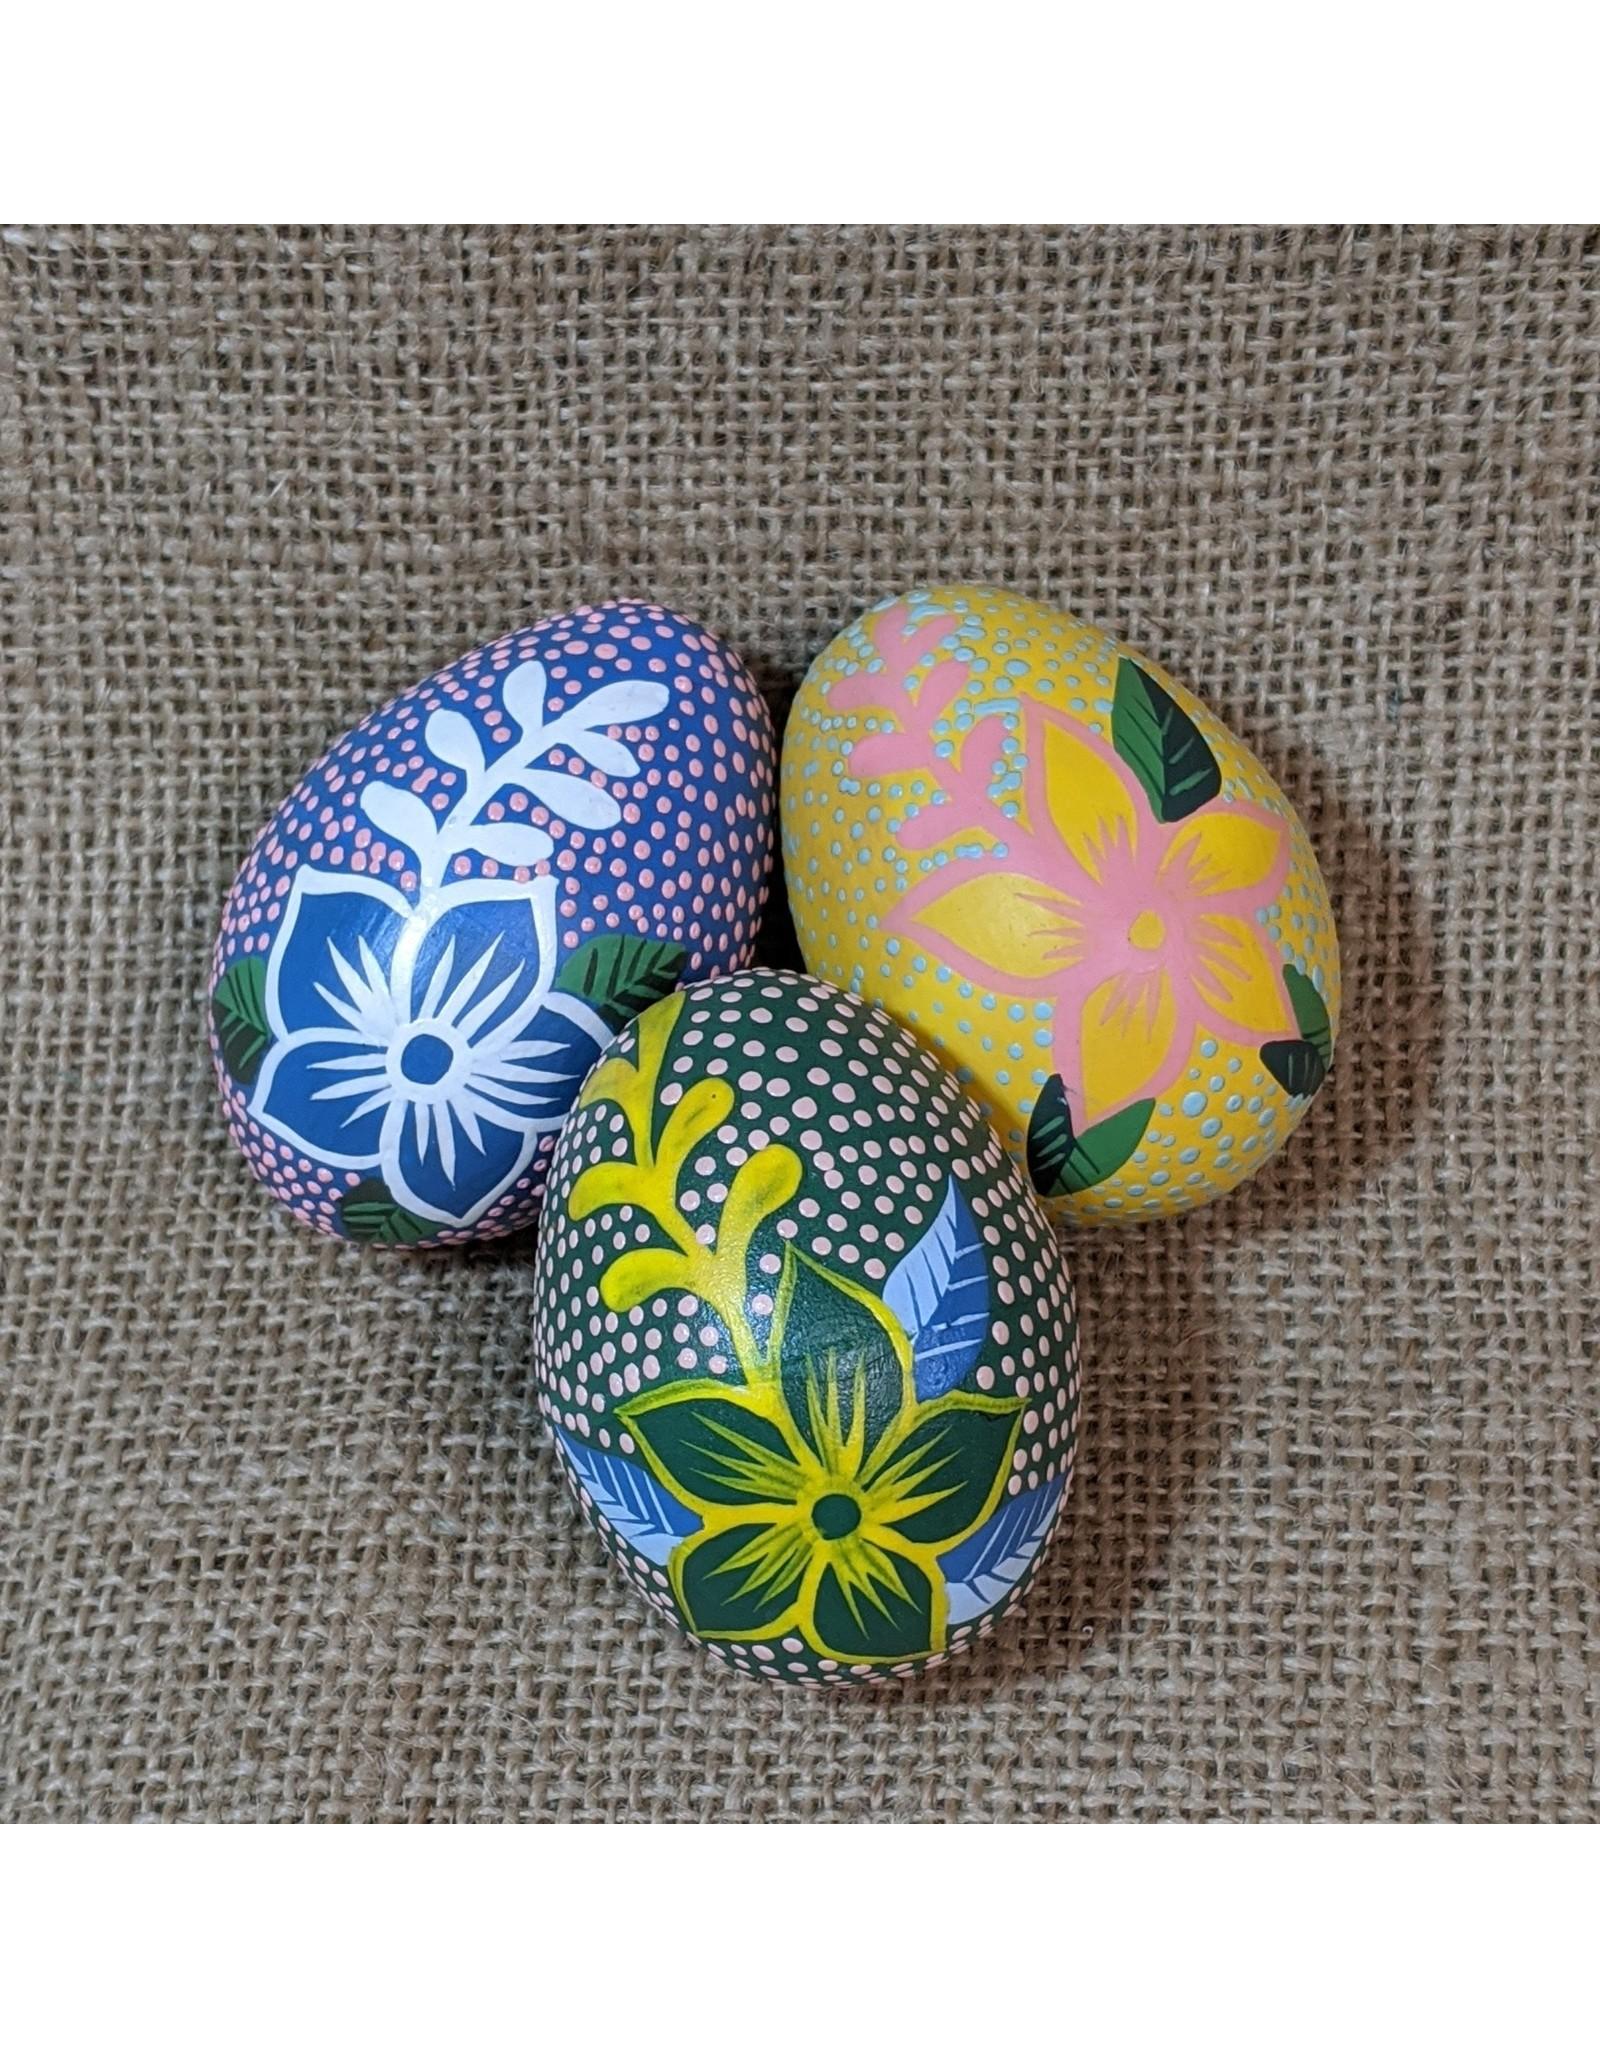 Ten Thousand Villages Shaker eggs